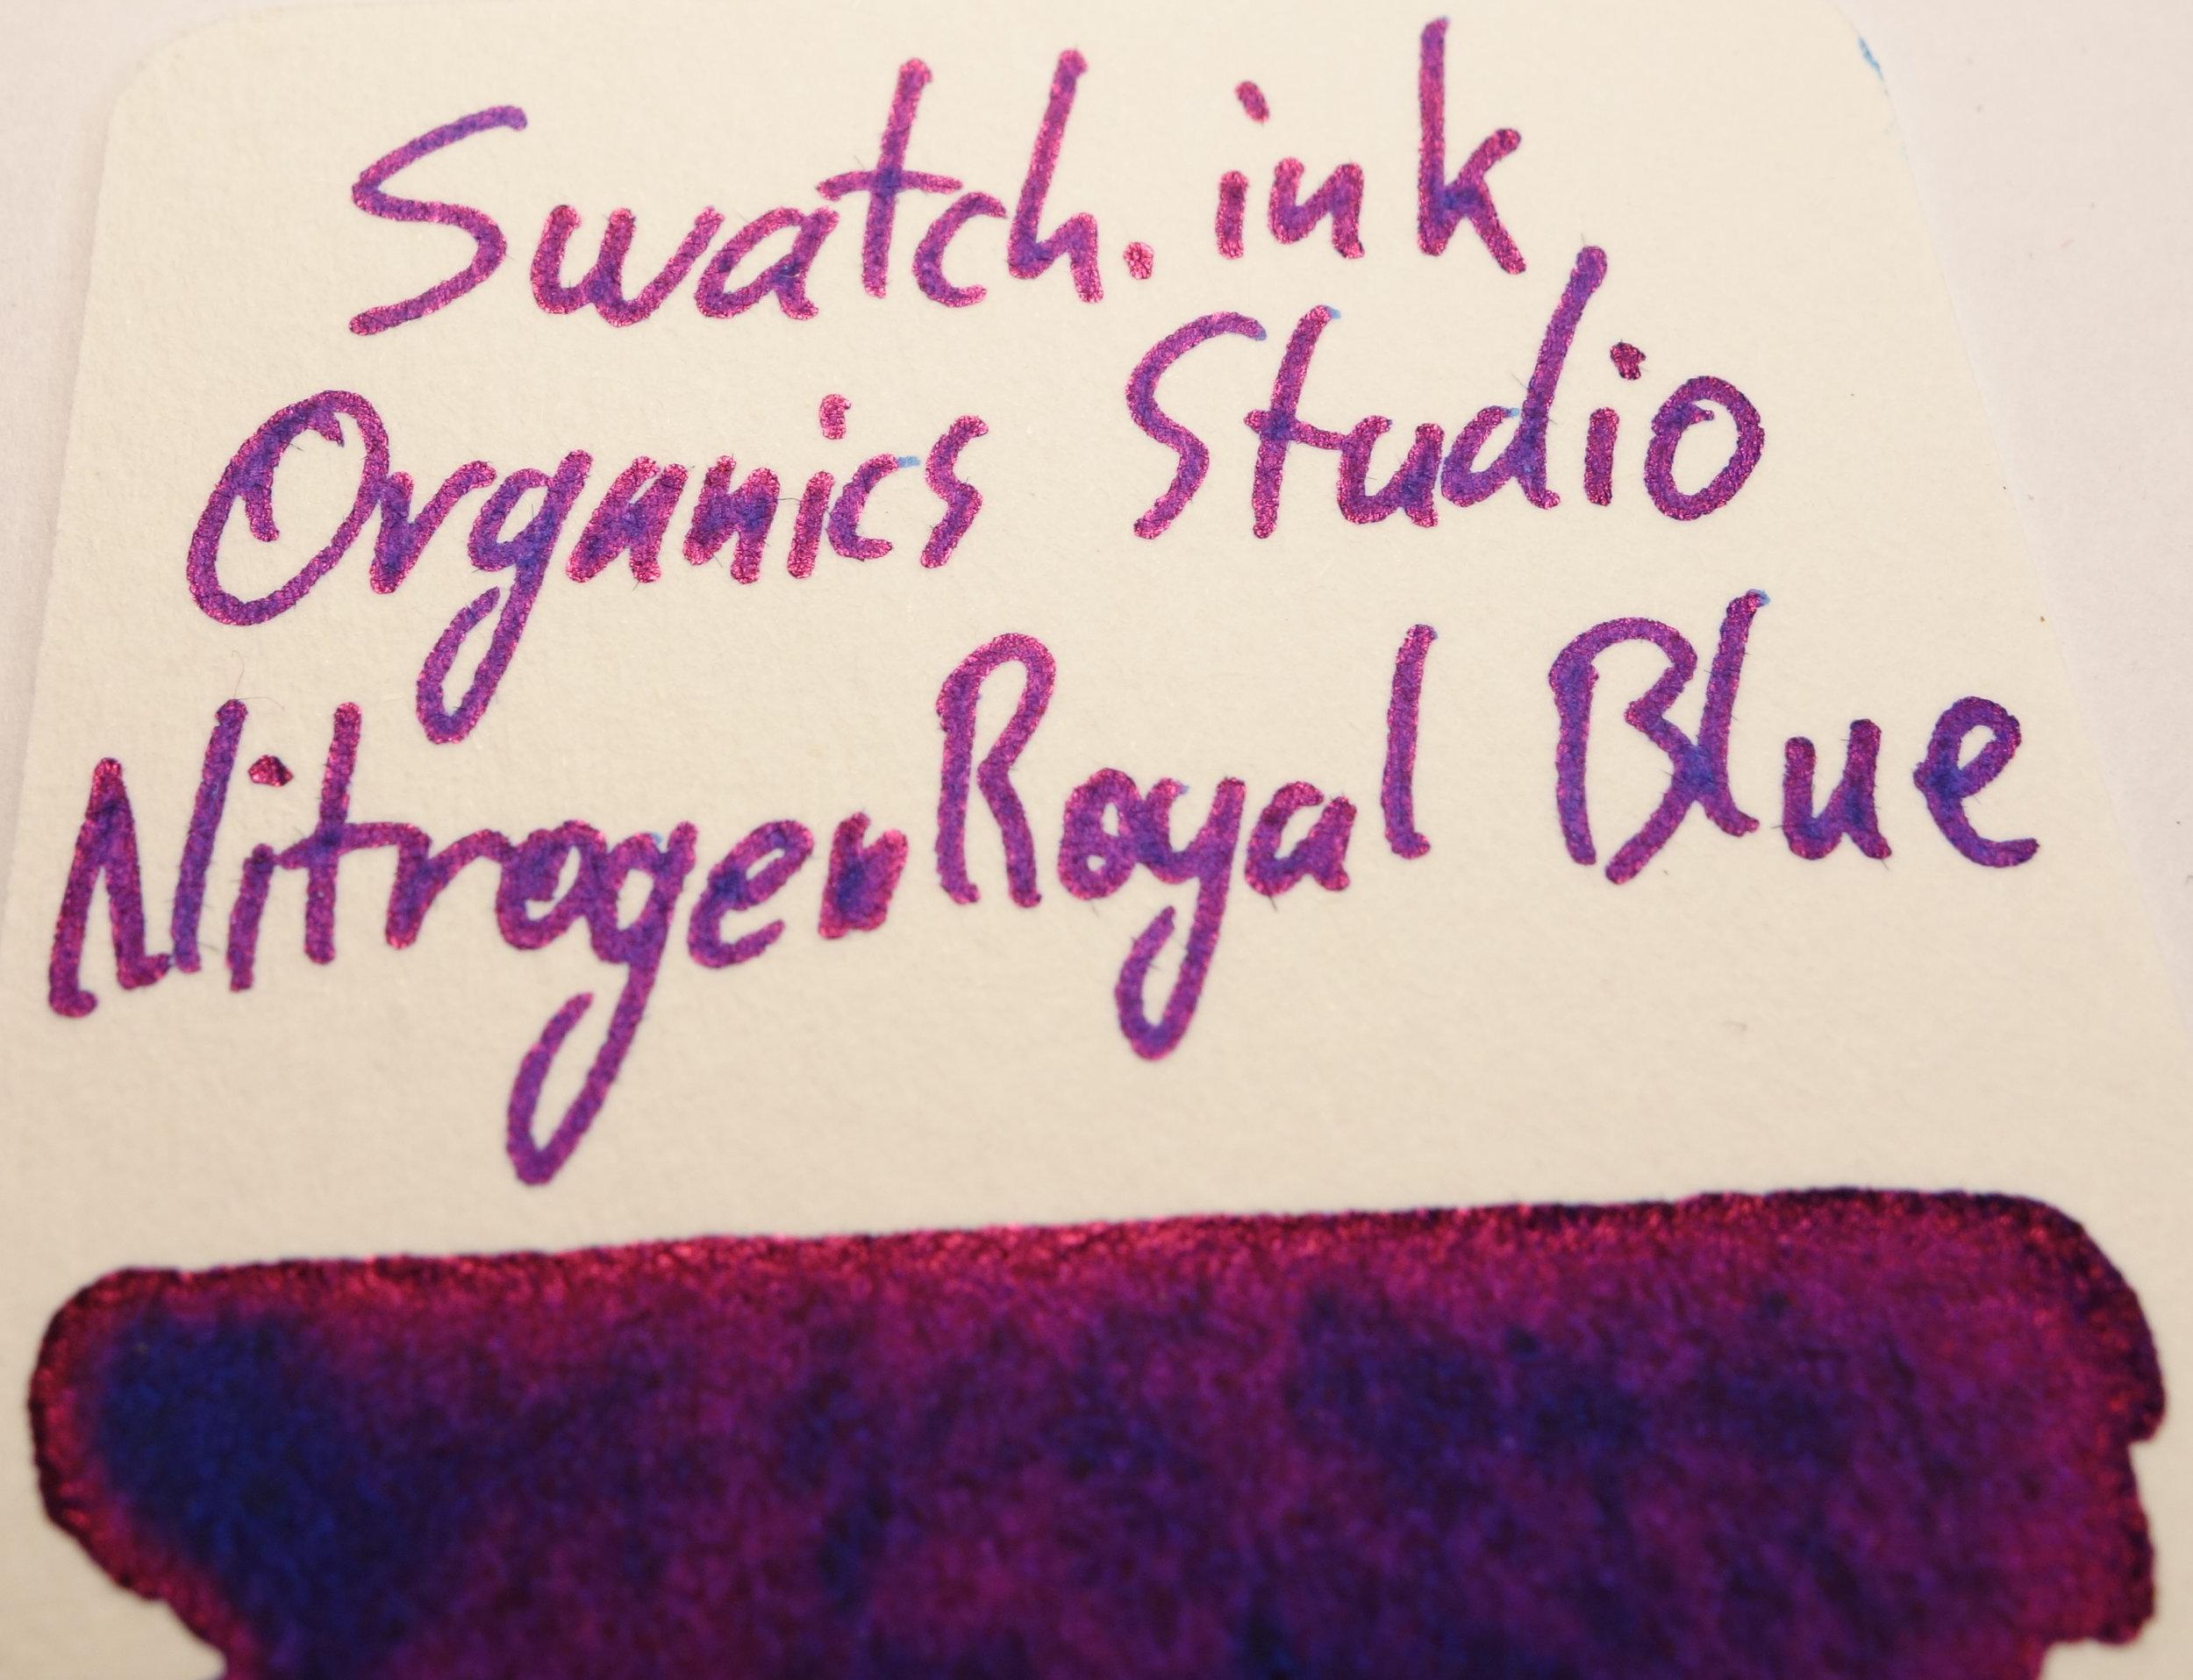 Organics Studio Nitrogen Royal Blue Sheen Swatch.ink.JPG